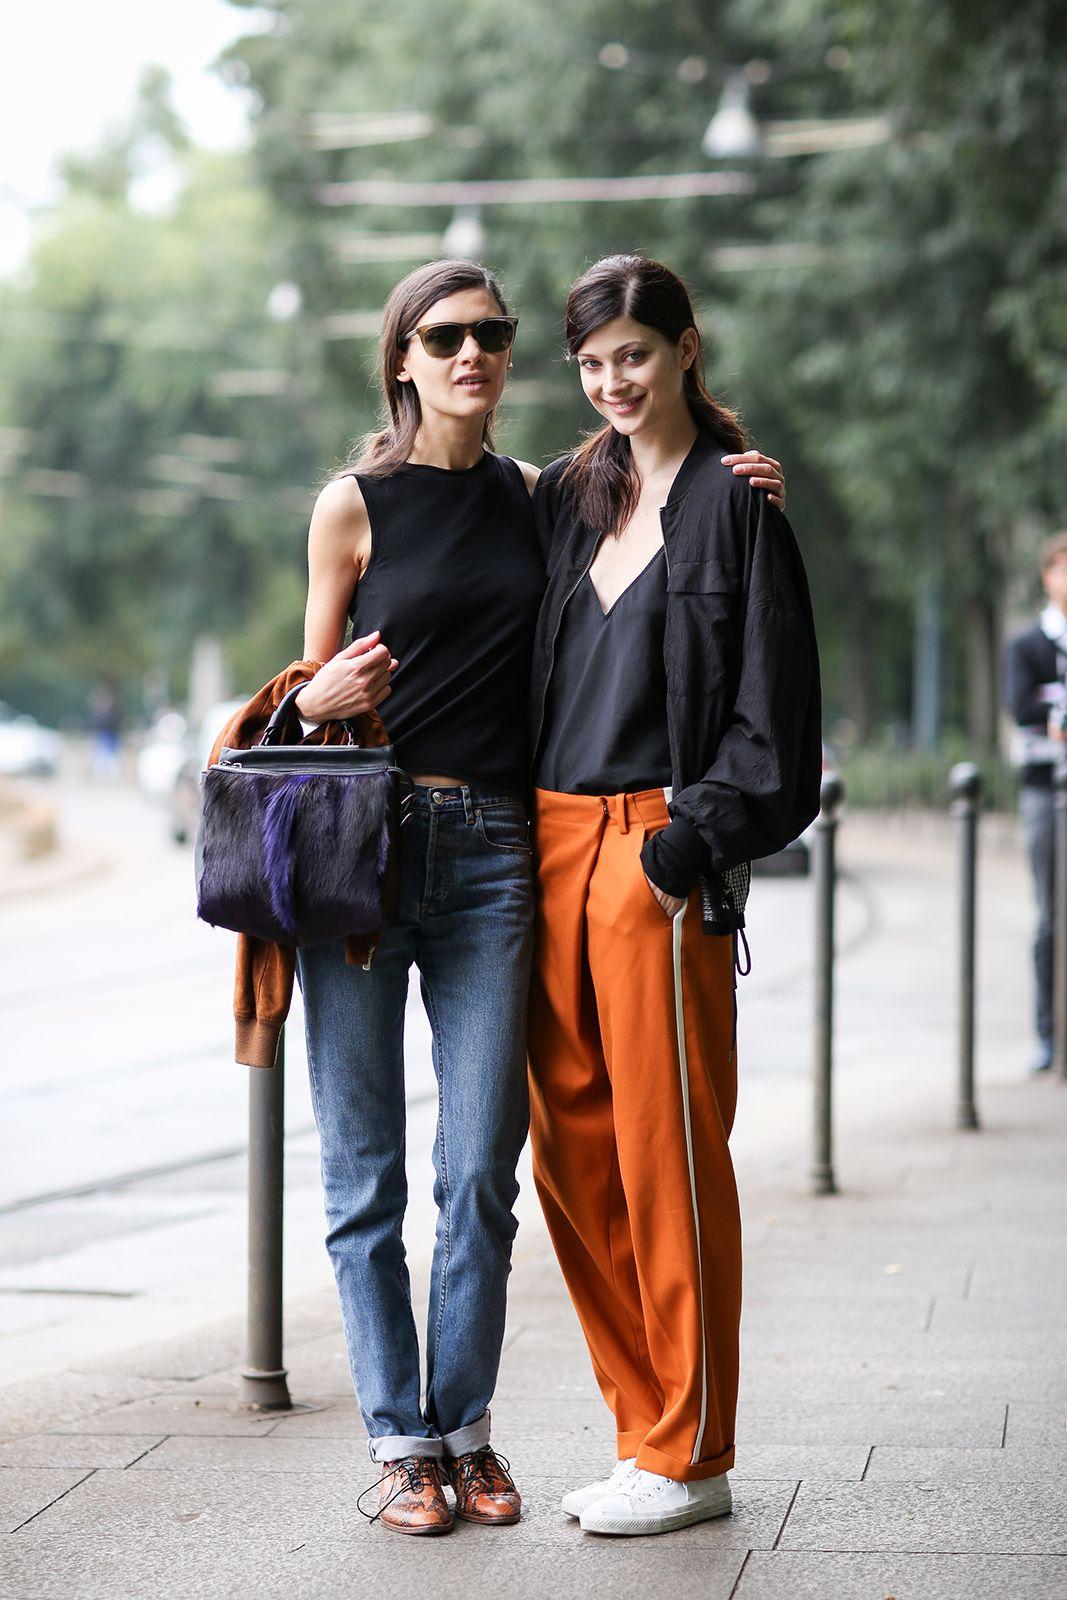 4291e64665bf2 Sorry, French Women: Italians Are Doing It Better. February 2019. How To Dress  Like An Italian ...